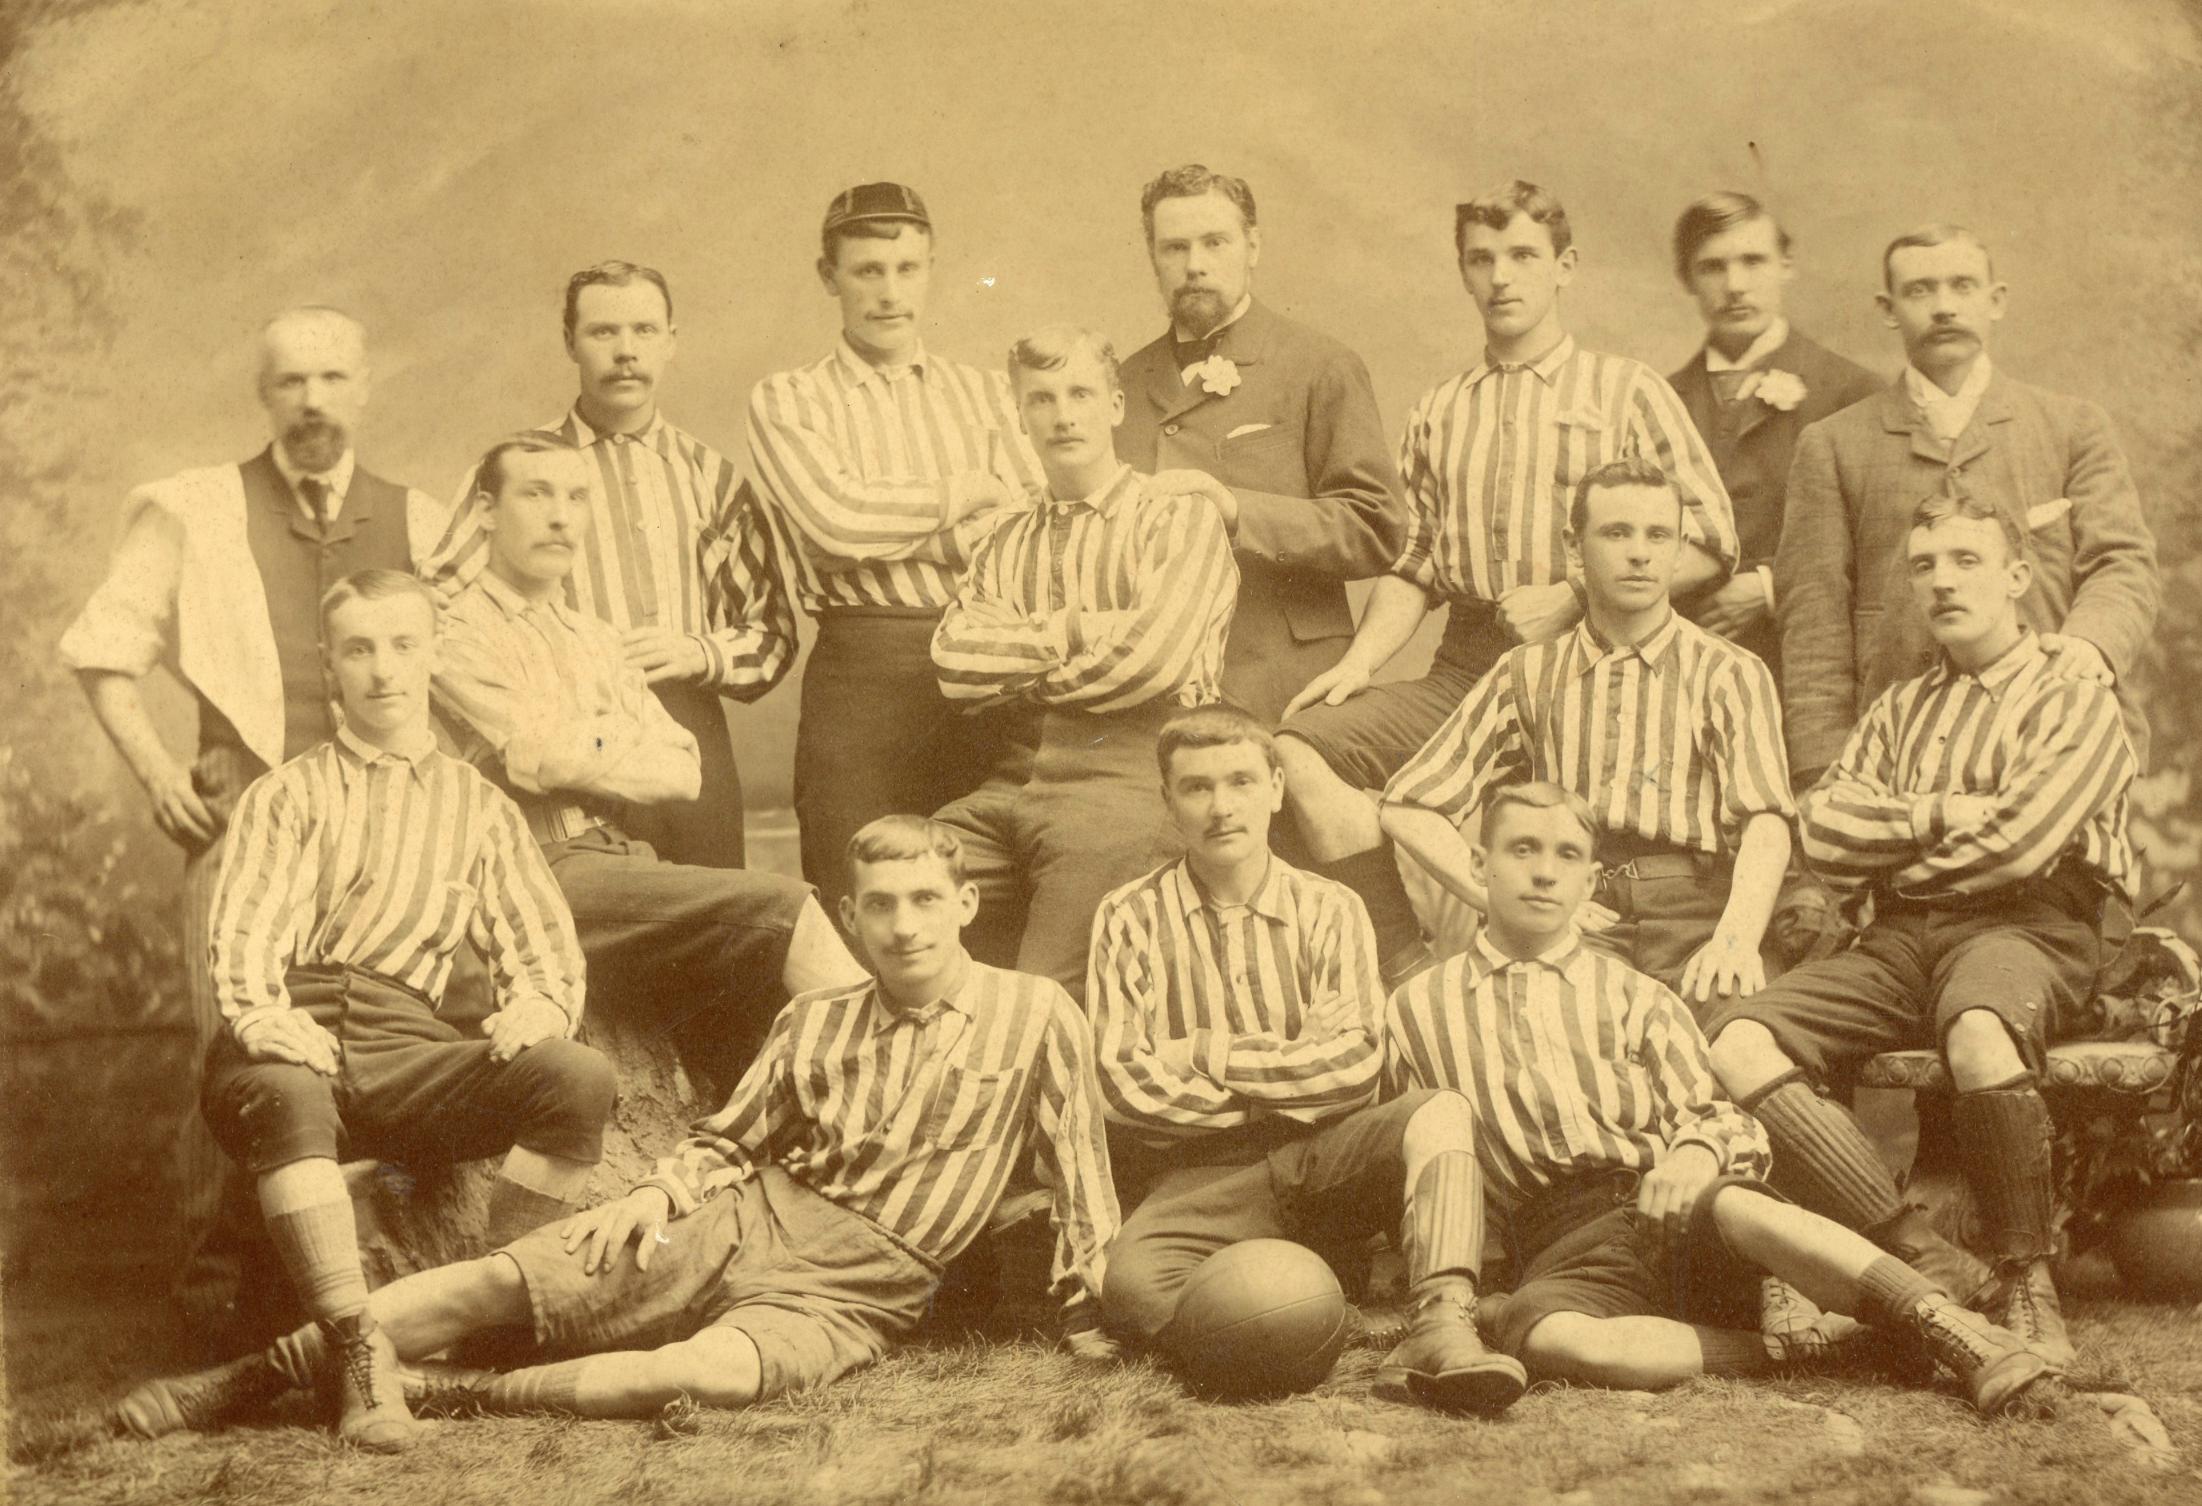 Strathmore F.C. 1891:92